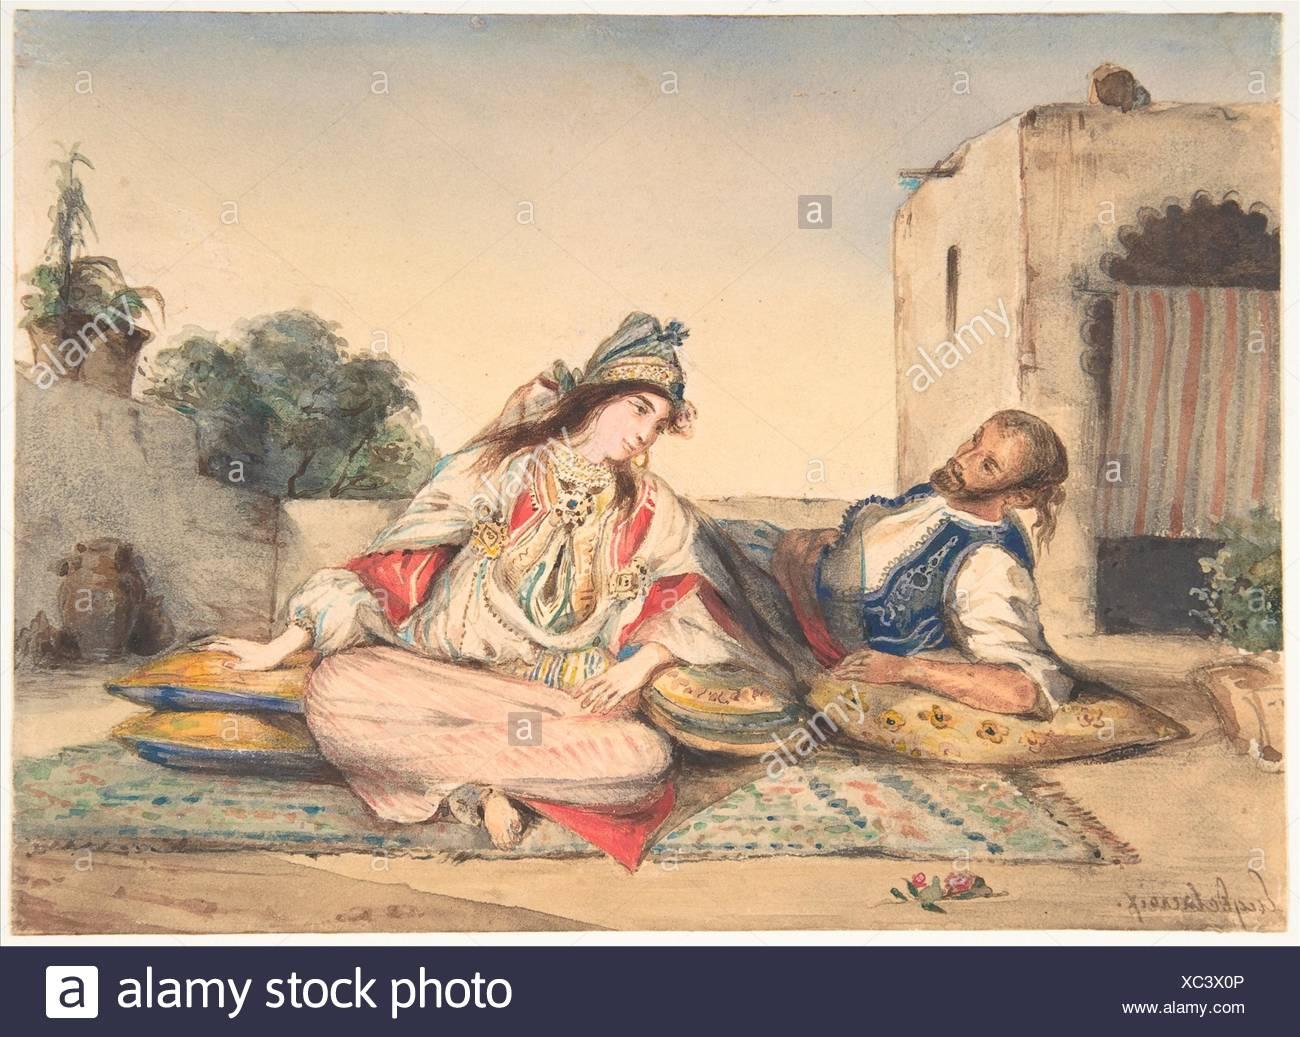 A Moorish Couple on Their Terrace. Artist: Eugène Delacroix (French, Charenton-Saint-Maurice 1798-1863 Paris); Date: 1832; Medium: Watercolor over Stock Photo